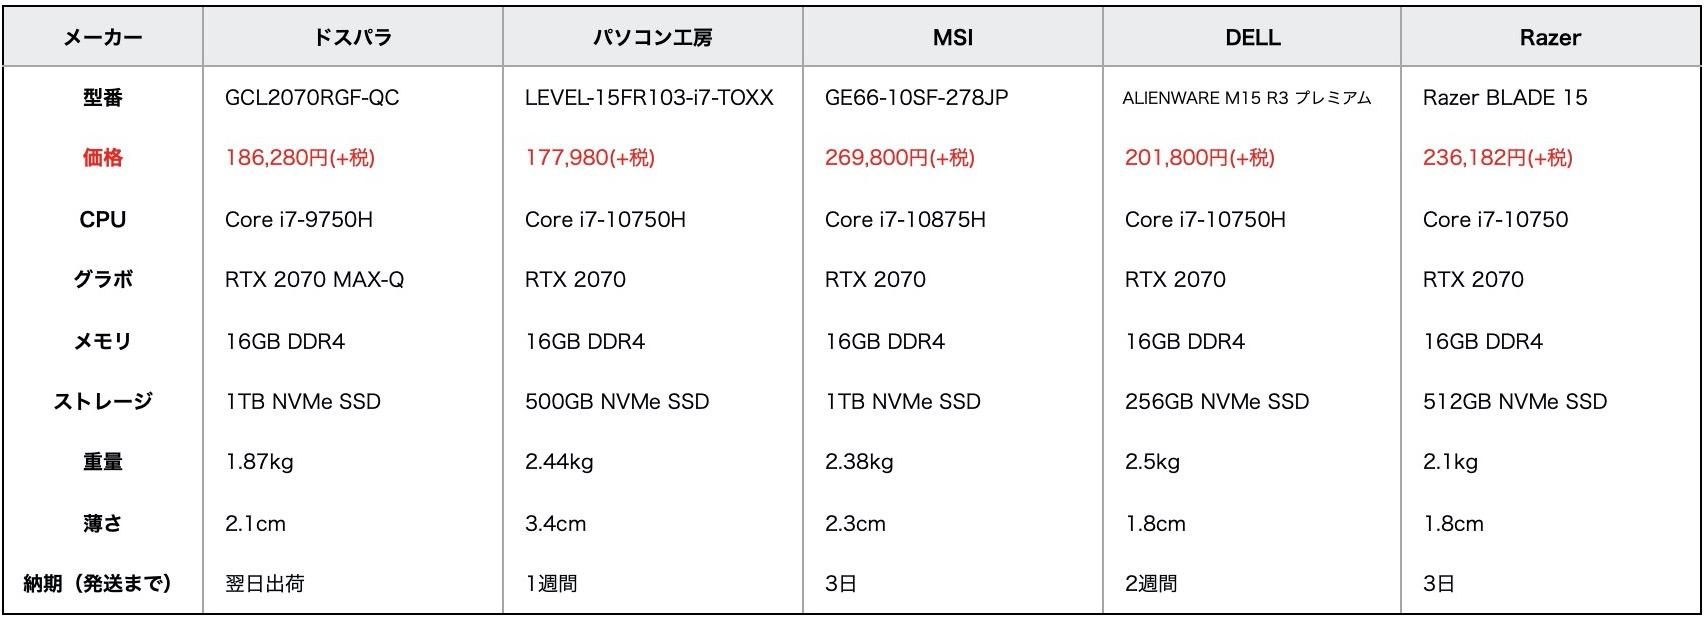 GCR2070RGF-QC_比較